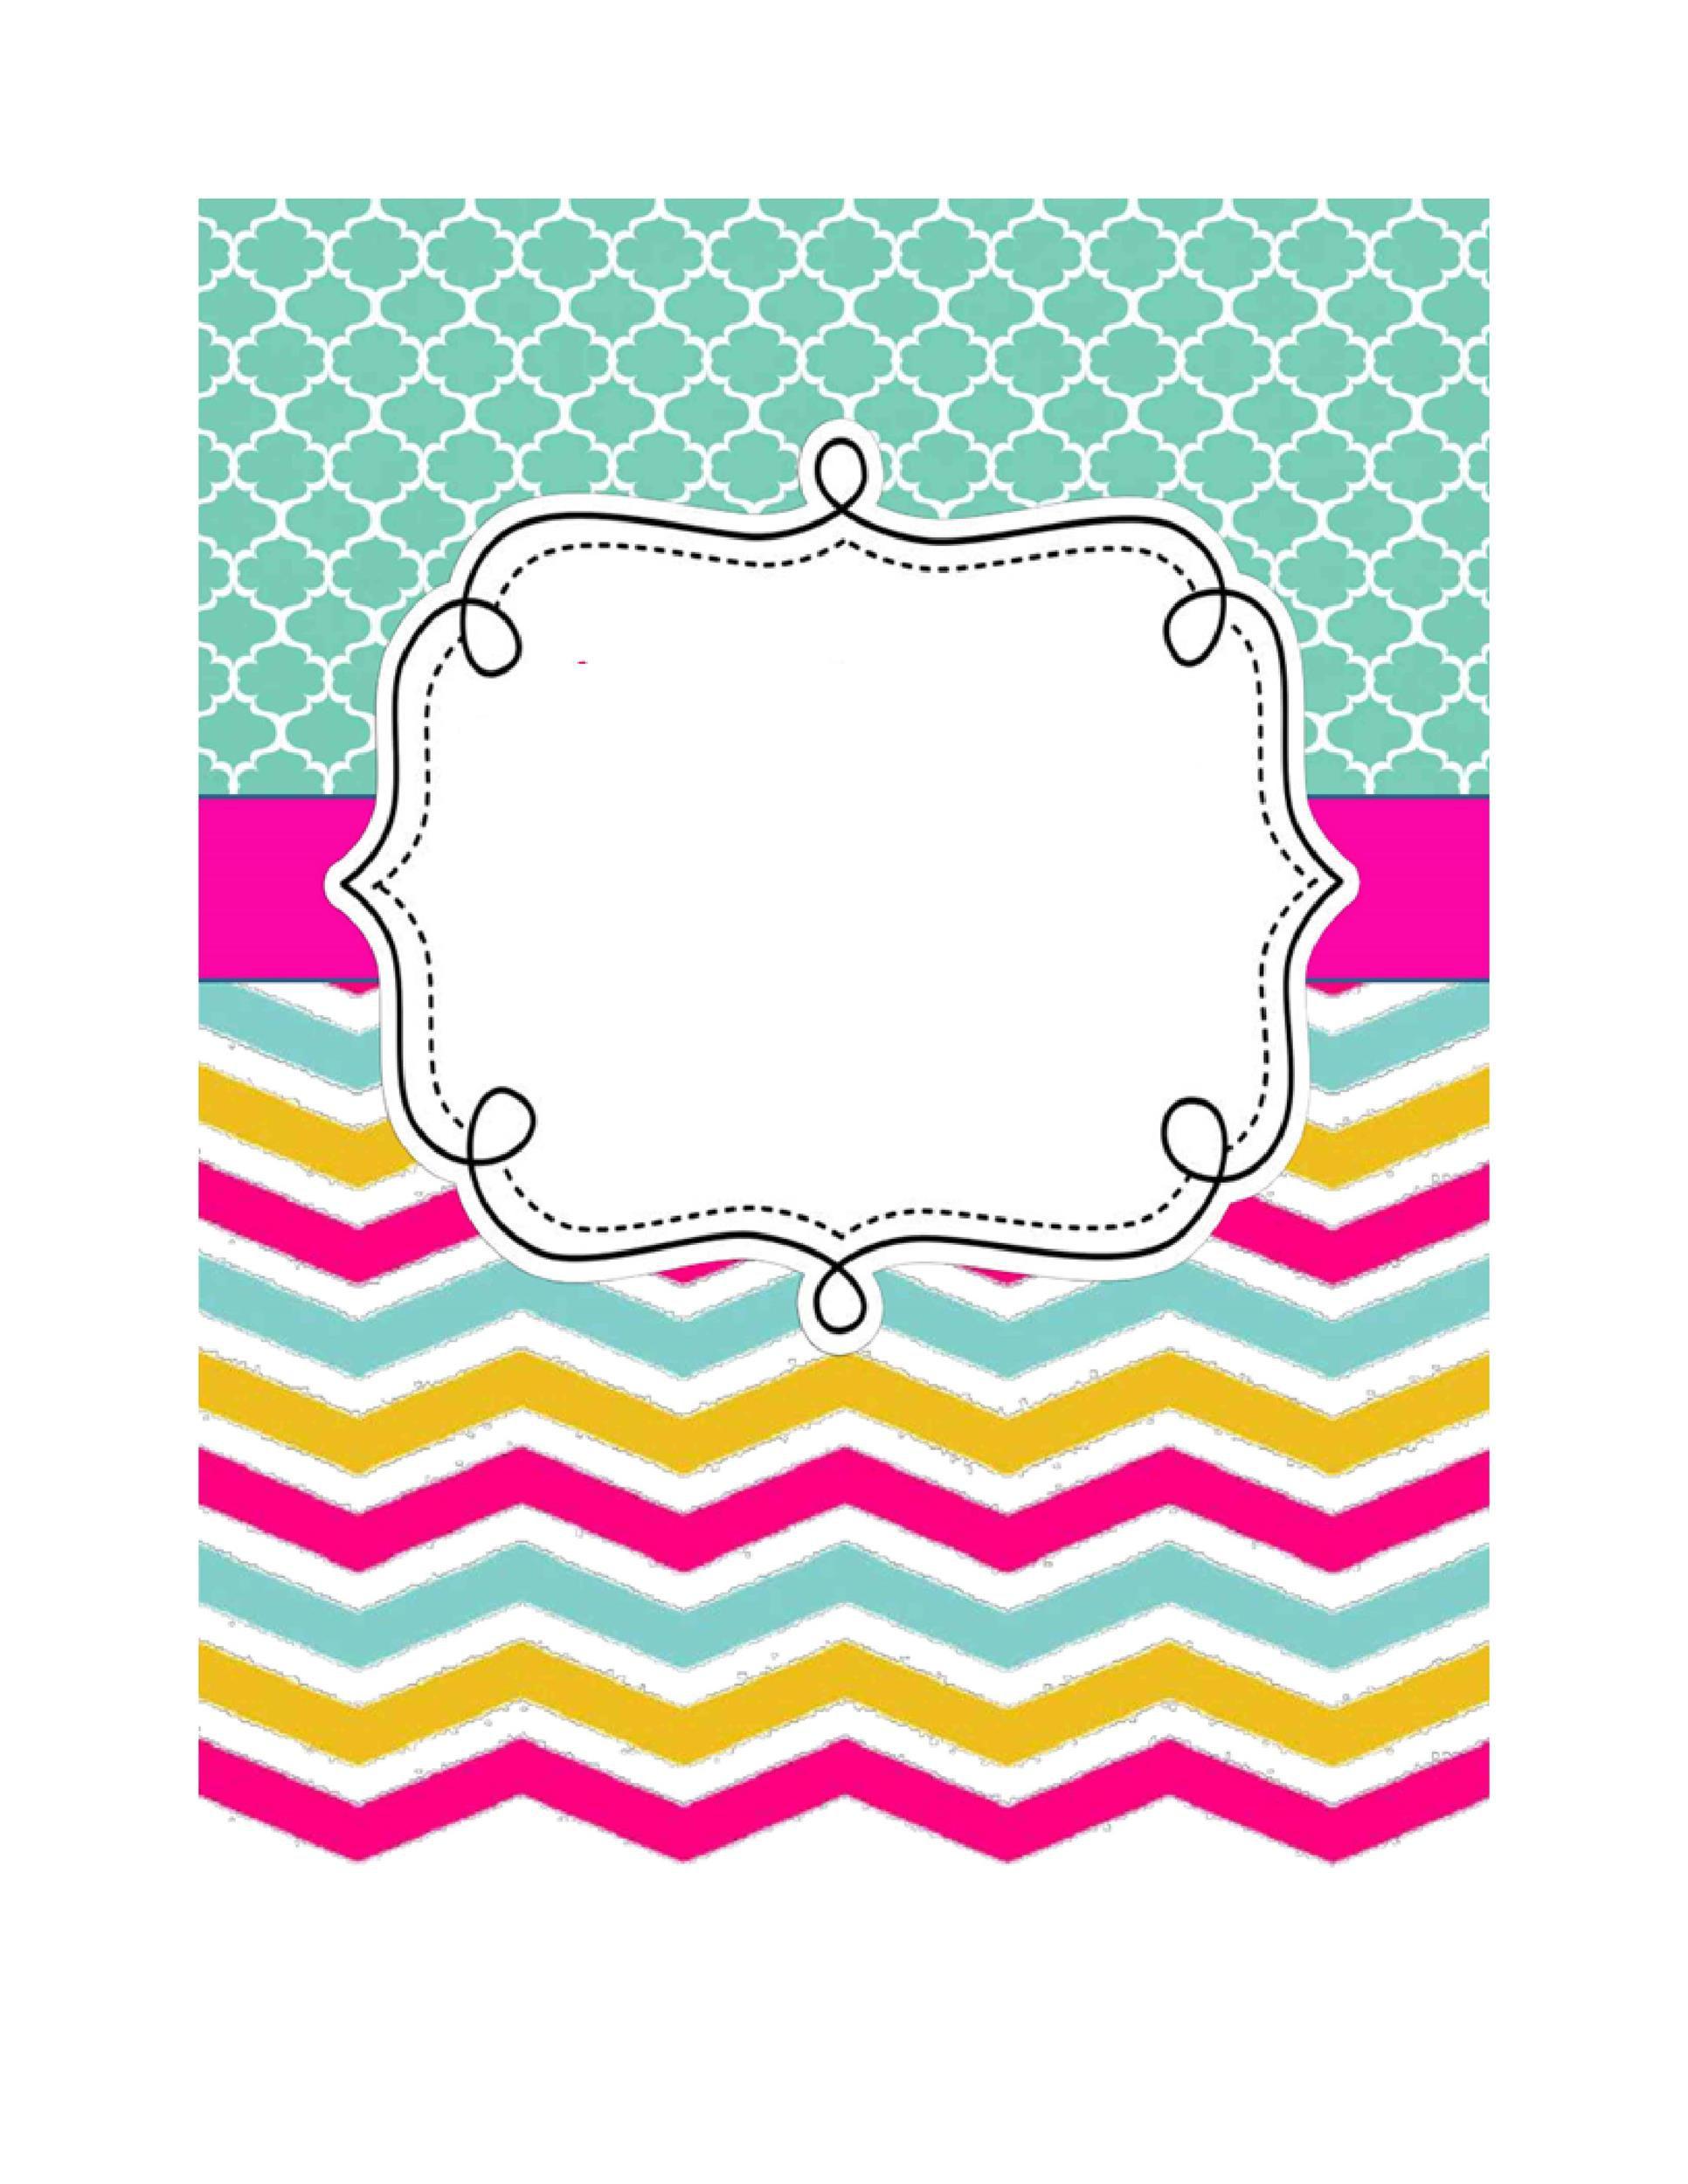 005 Beautiful Cute Binder Cover Template Free Printable Photo Full